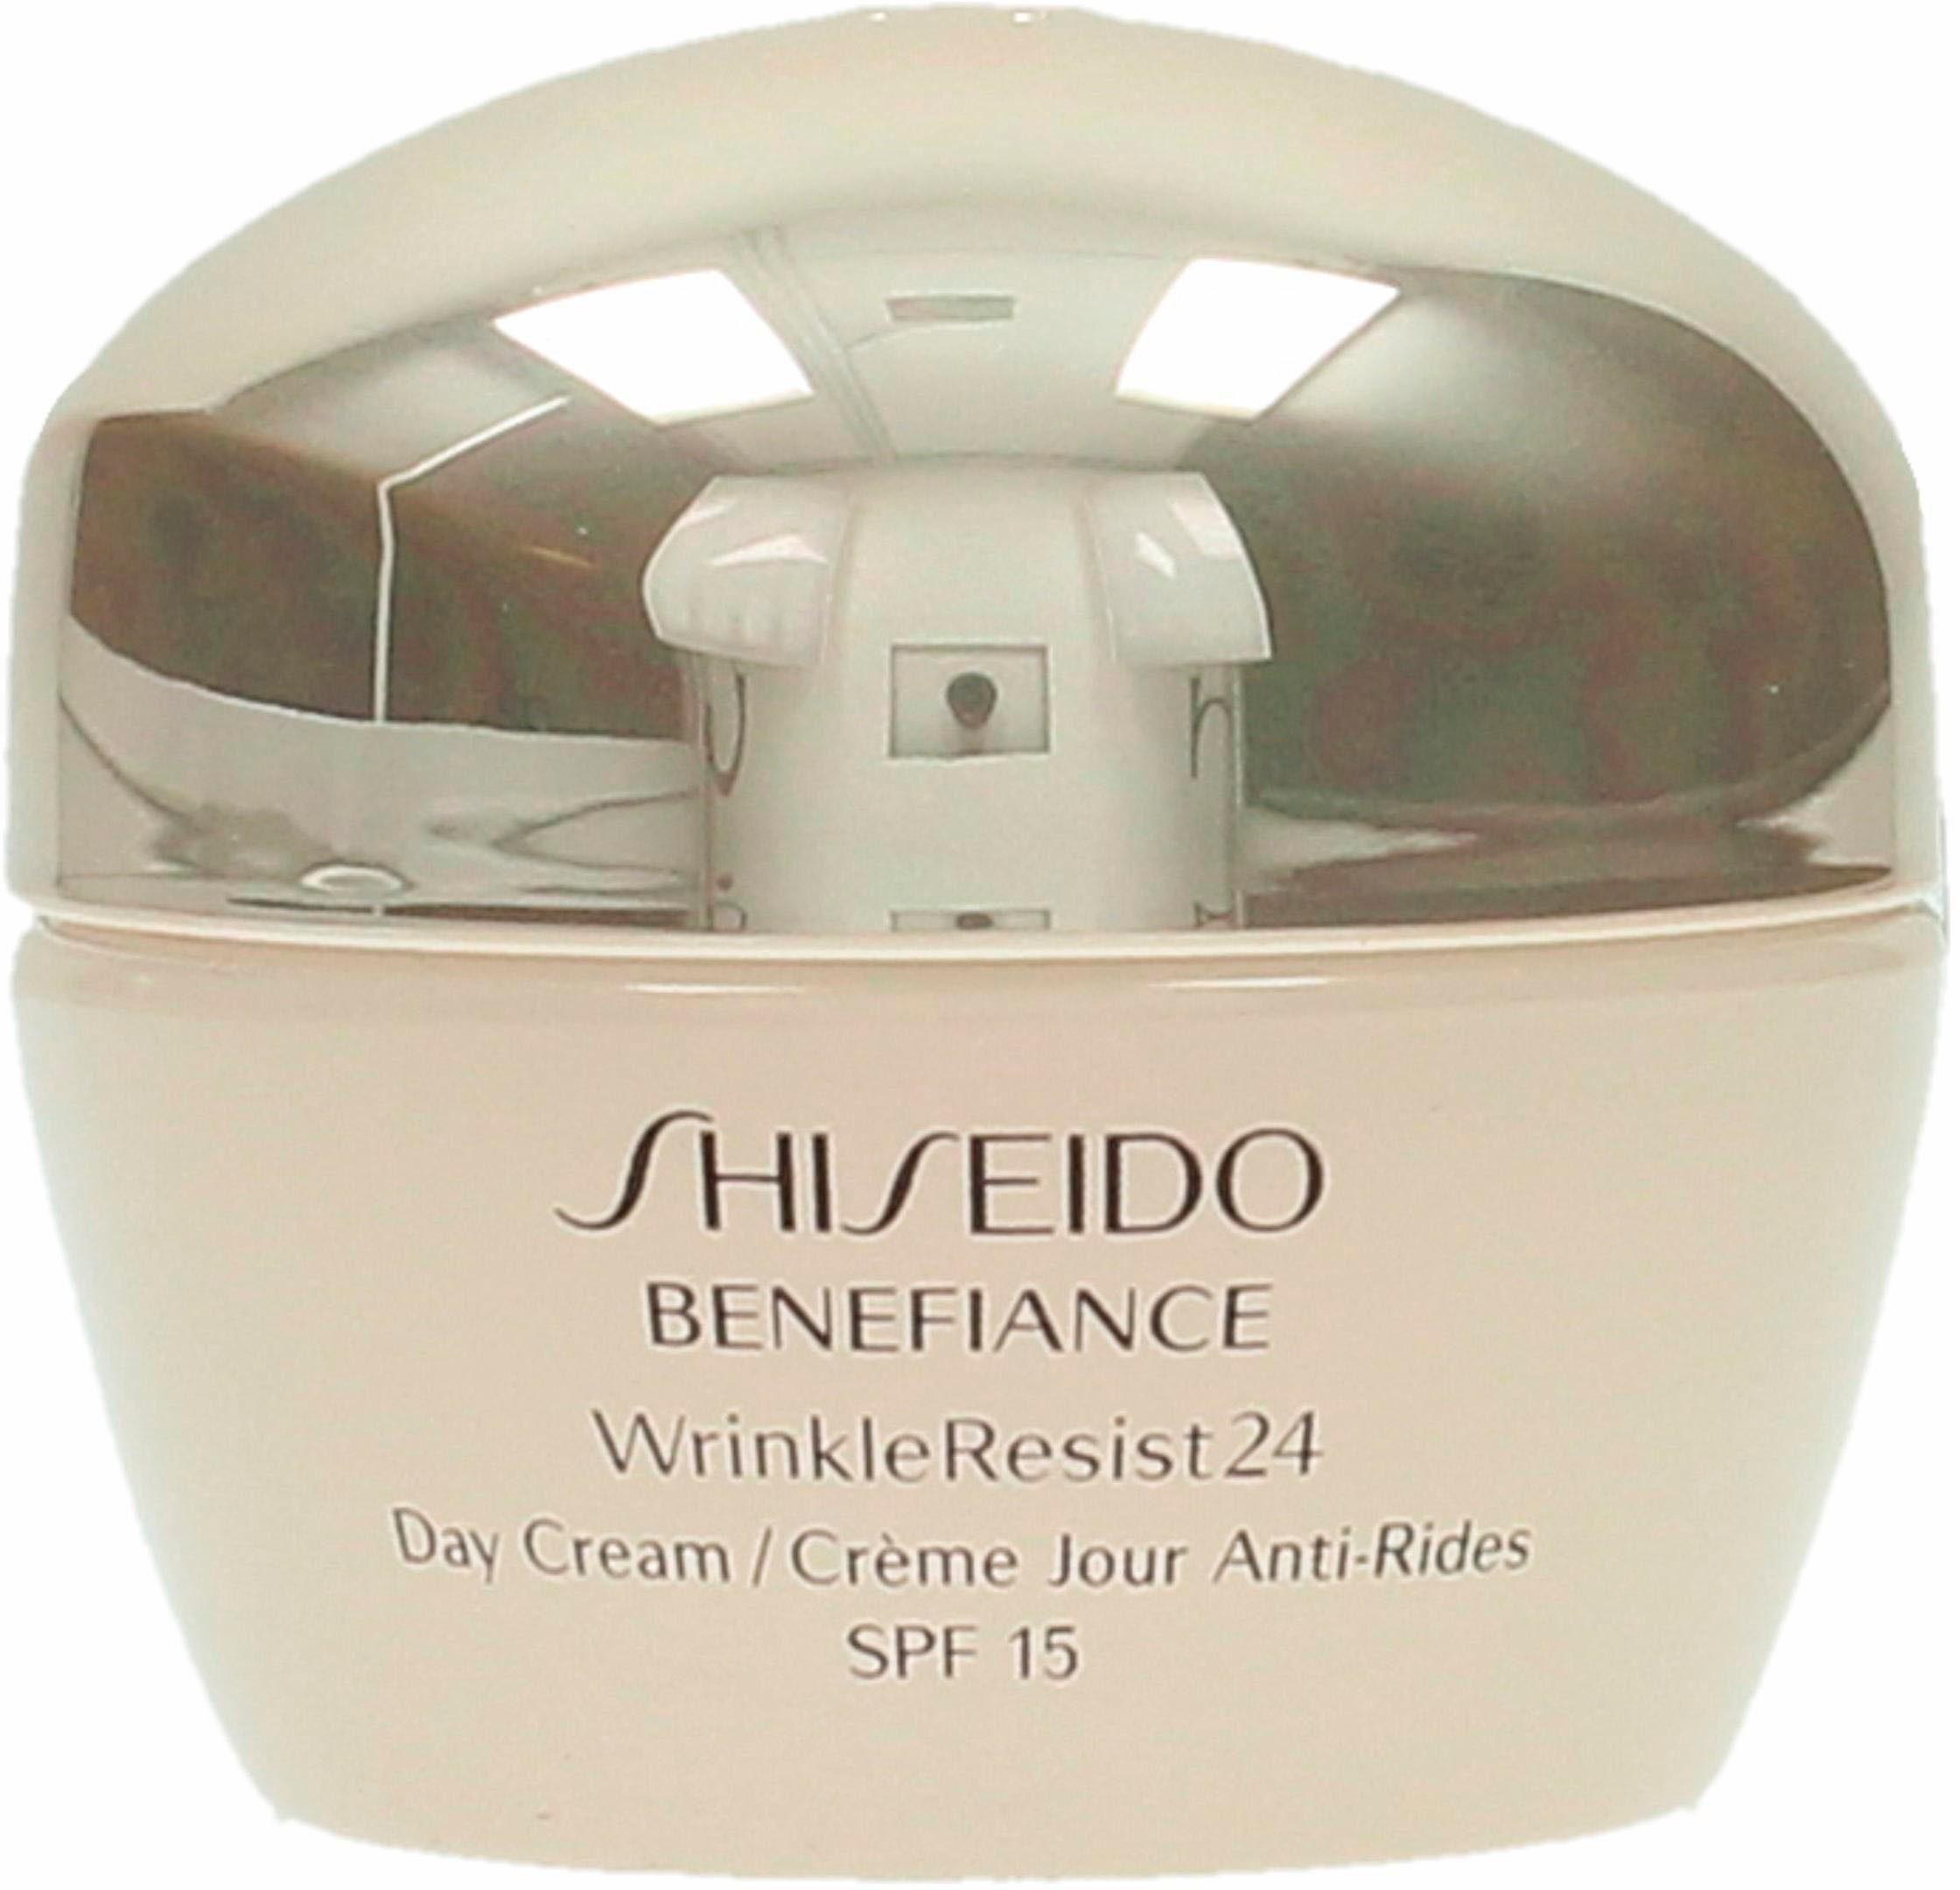 Shiseido, »Benefiance WrinkleResist 24 Day Cream«, Gesichtscreme